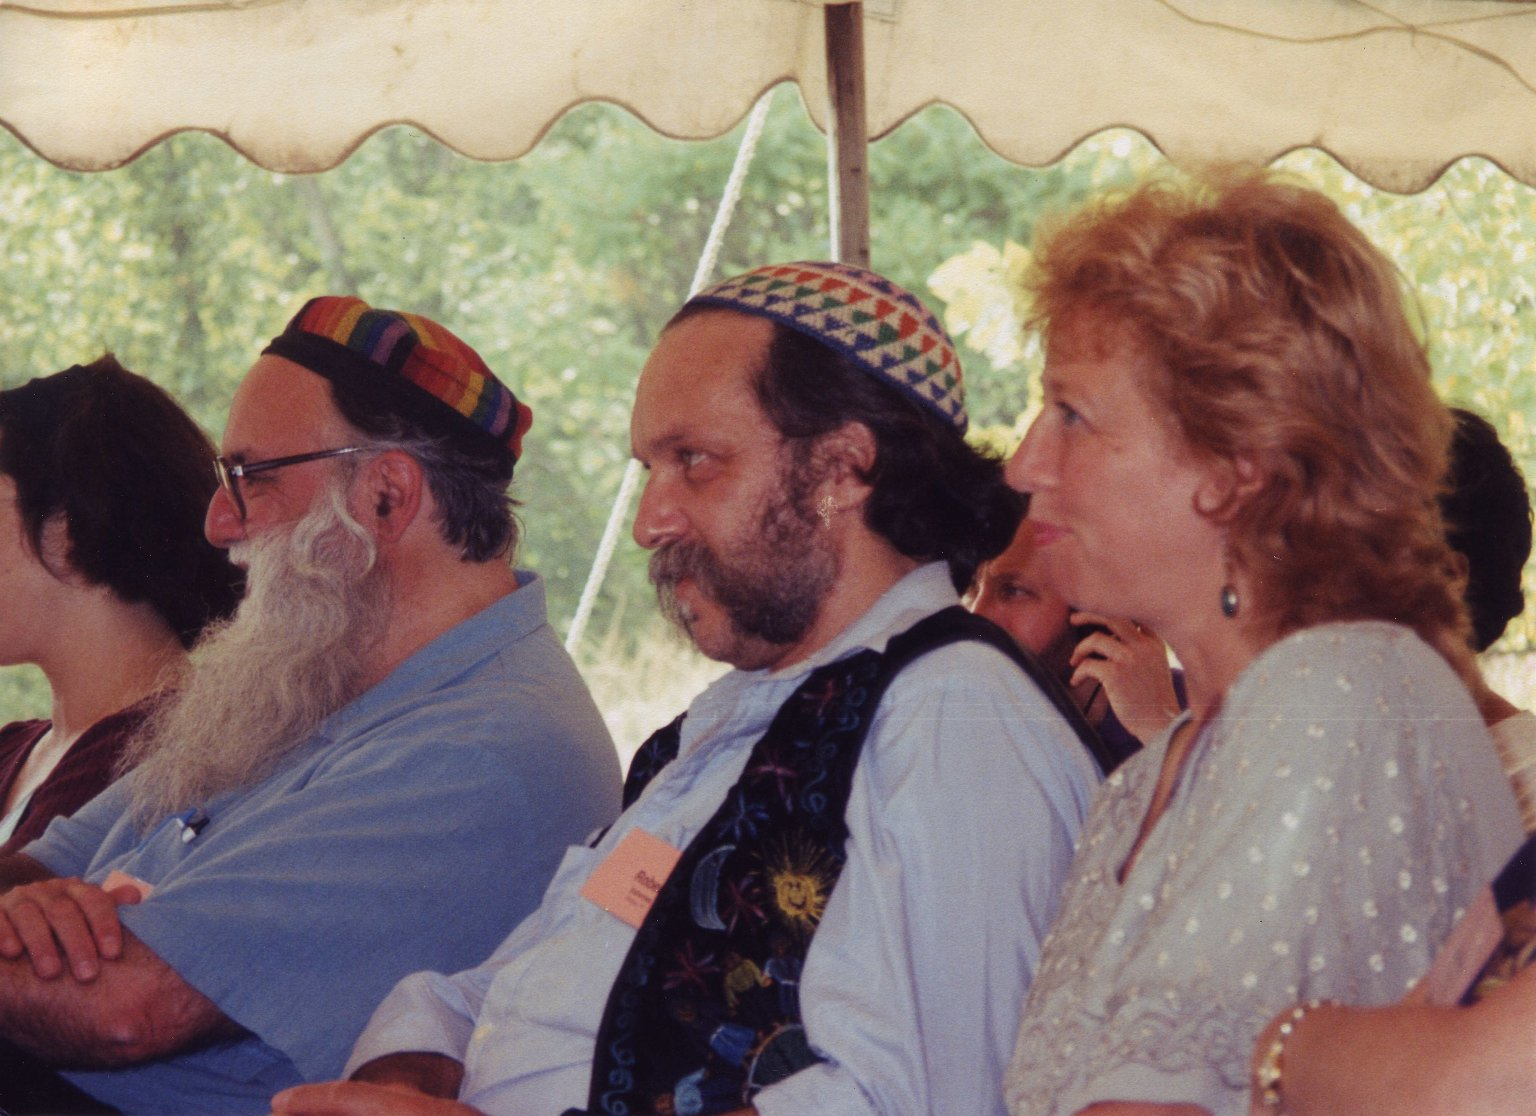 Candid photo from Rabbi Zalman Schachter-Shalomi's 75th birthday celebration at Elat Chayyim, ca. 1999.